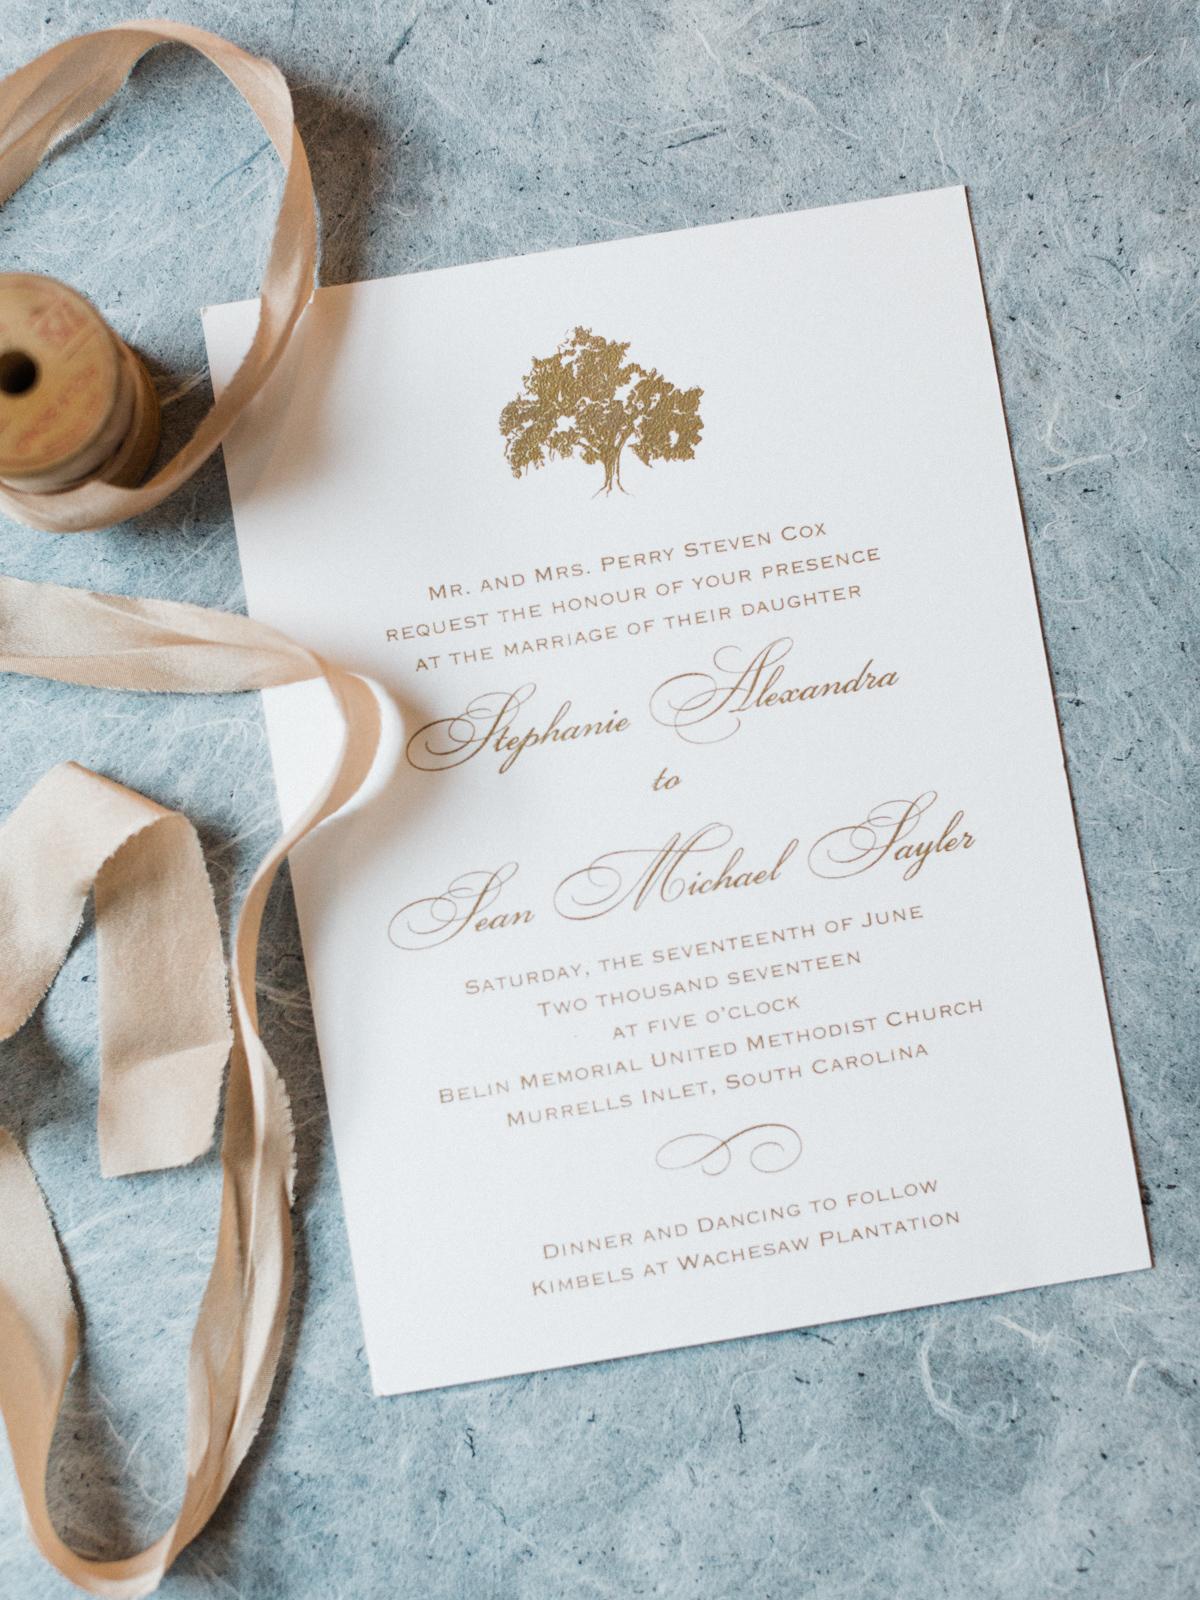 wachesaw-plantation-wedding-001.jpg